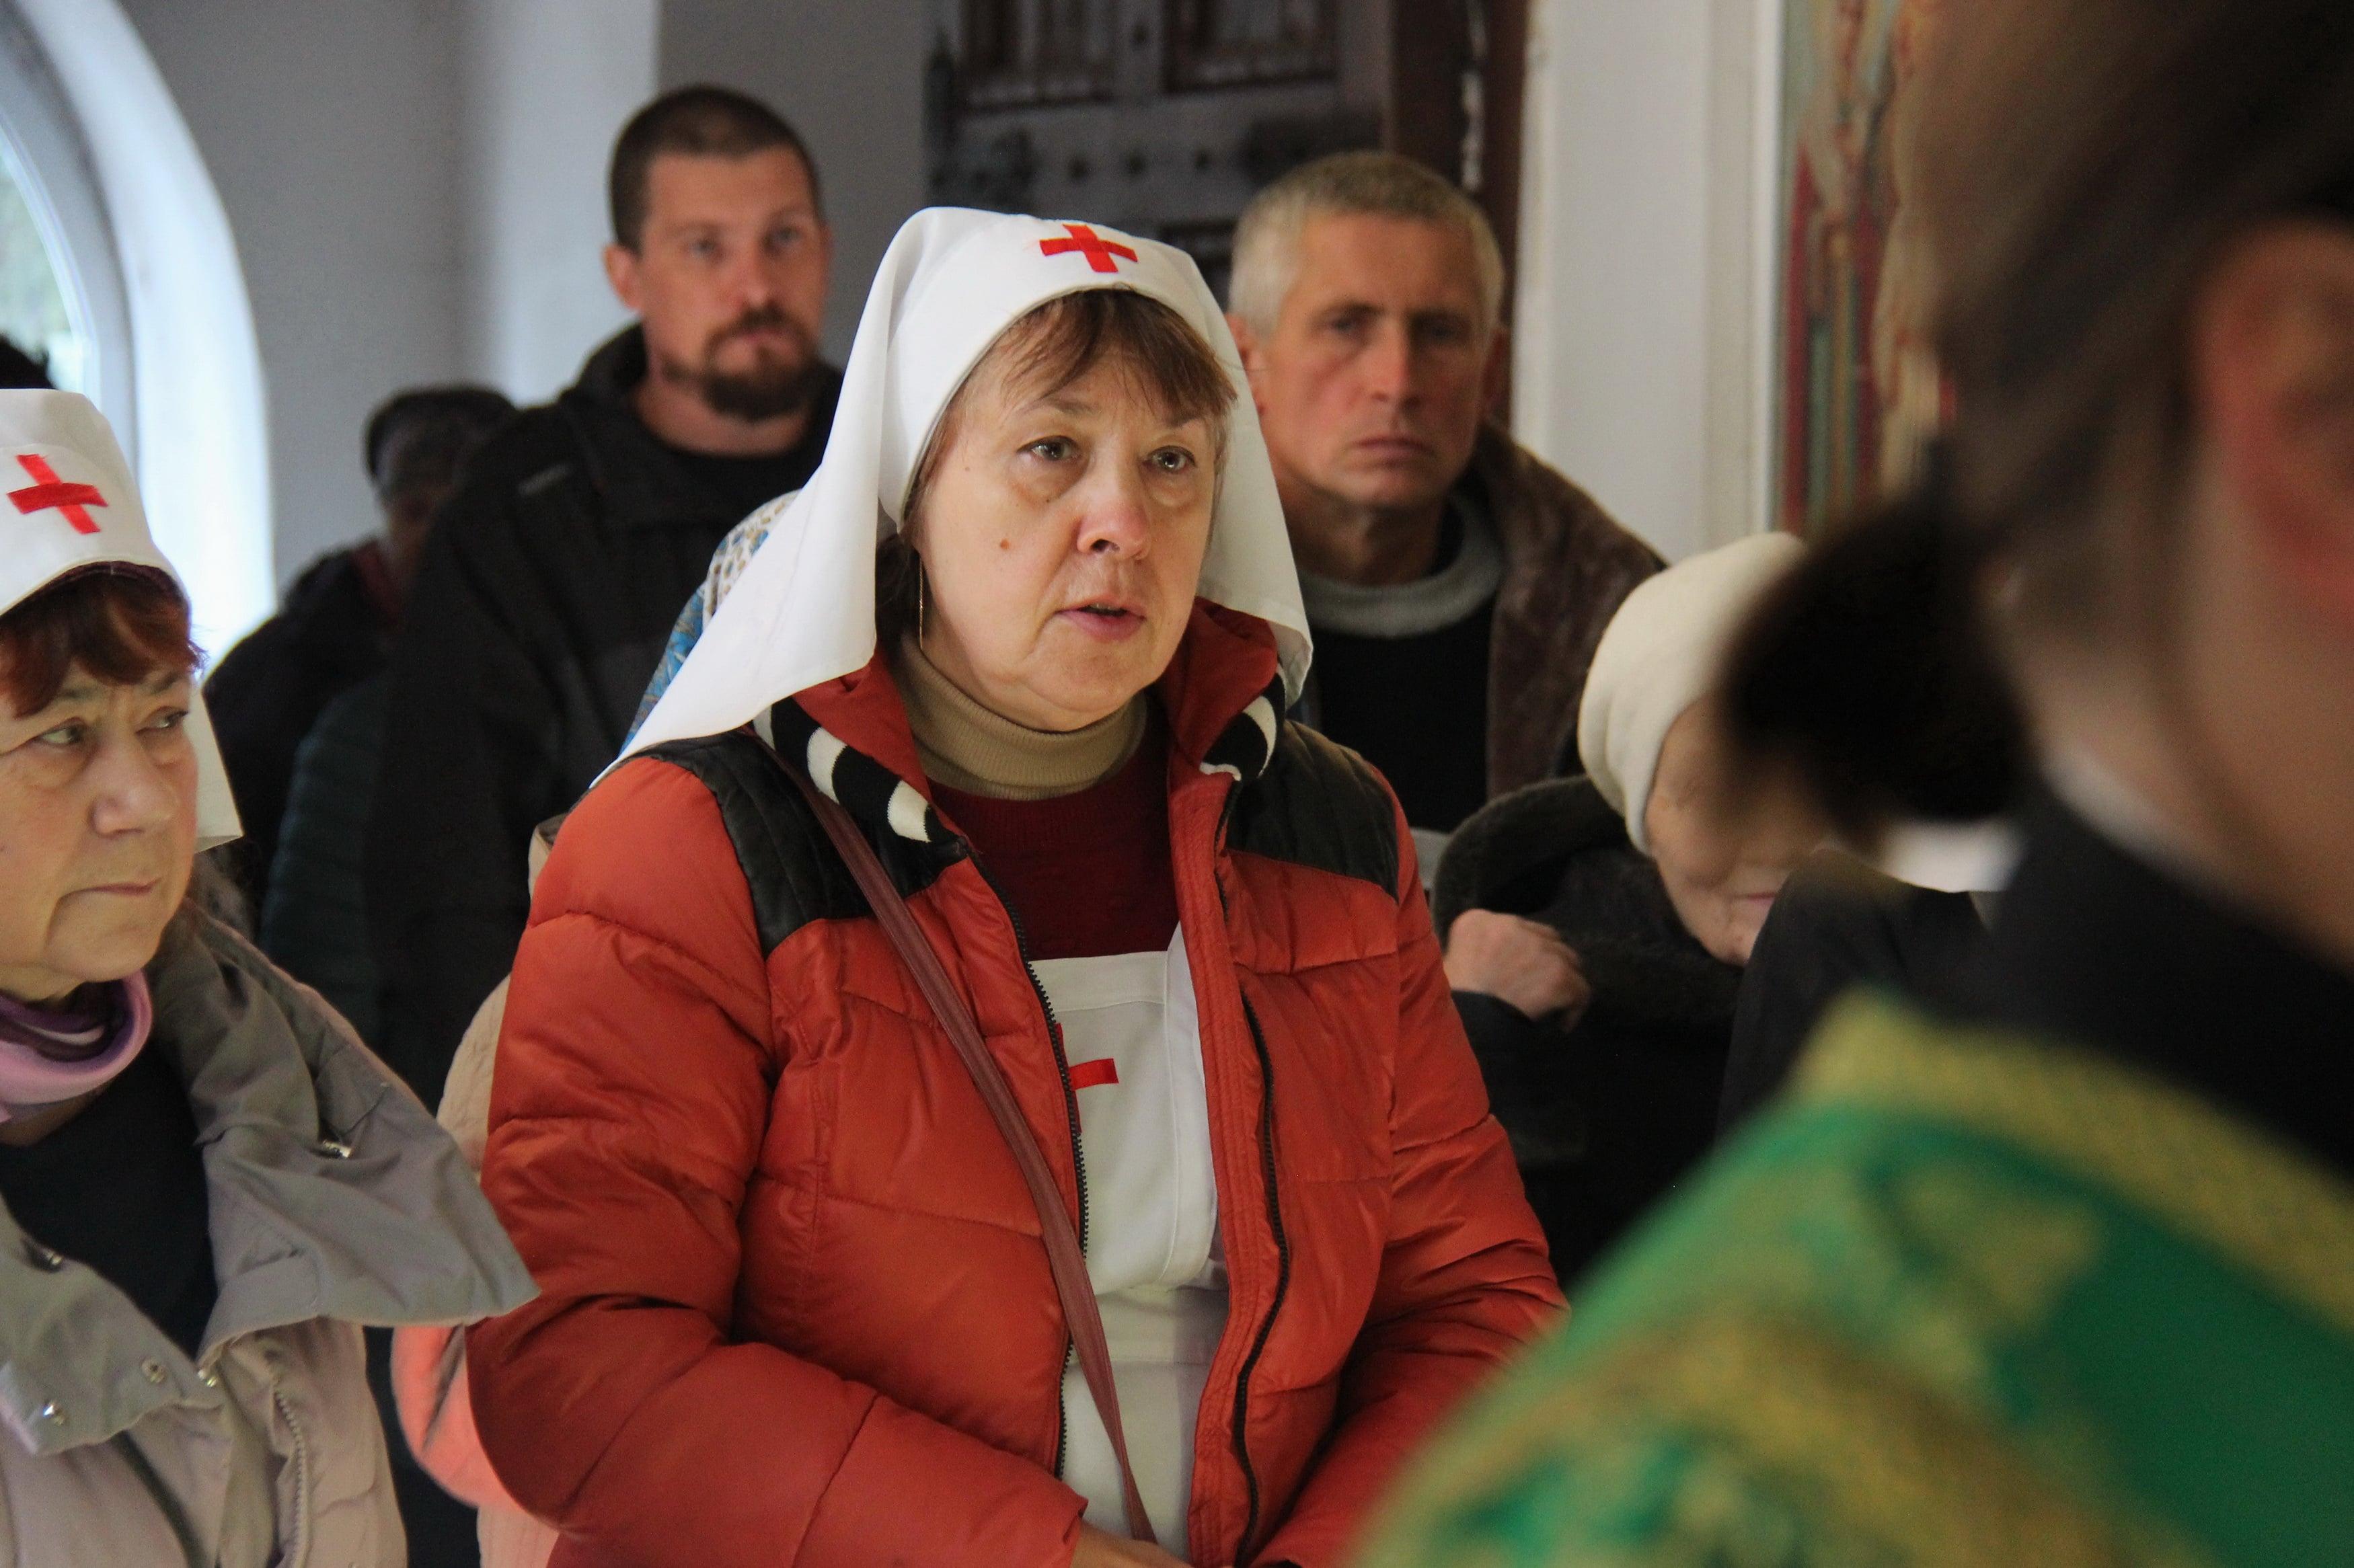 http://monuspen.ru/photoreports/e378941596179341346f1391ec95b2c9.JPG